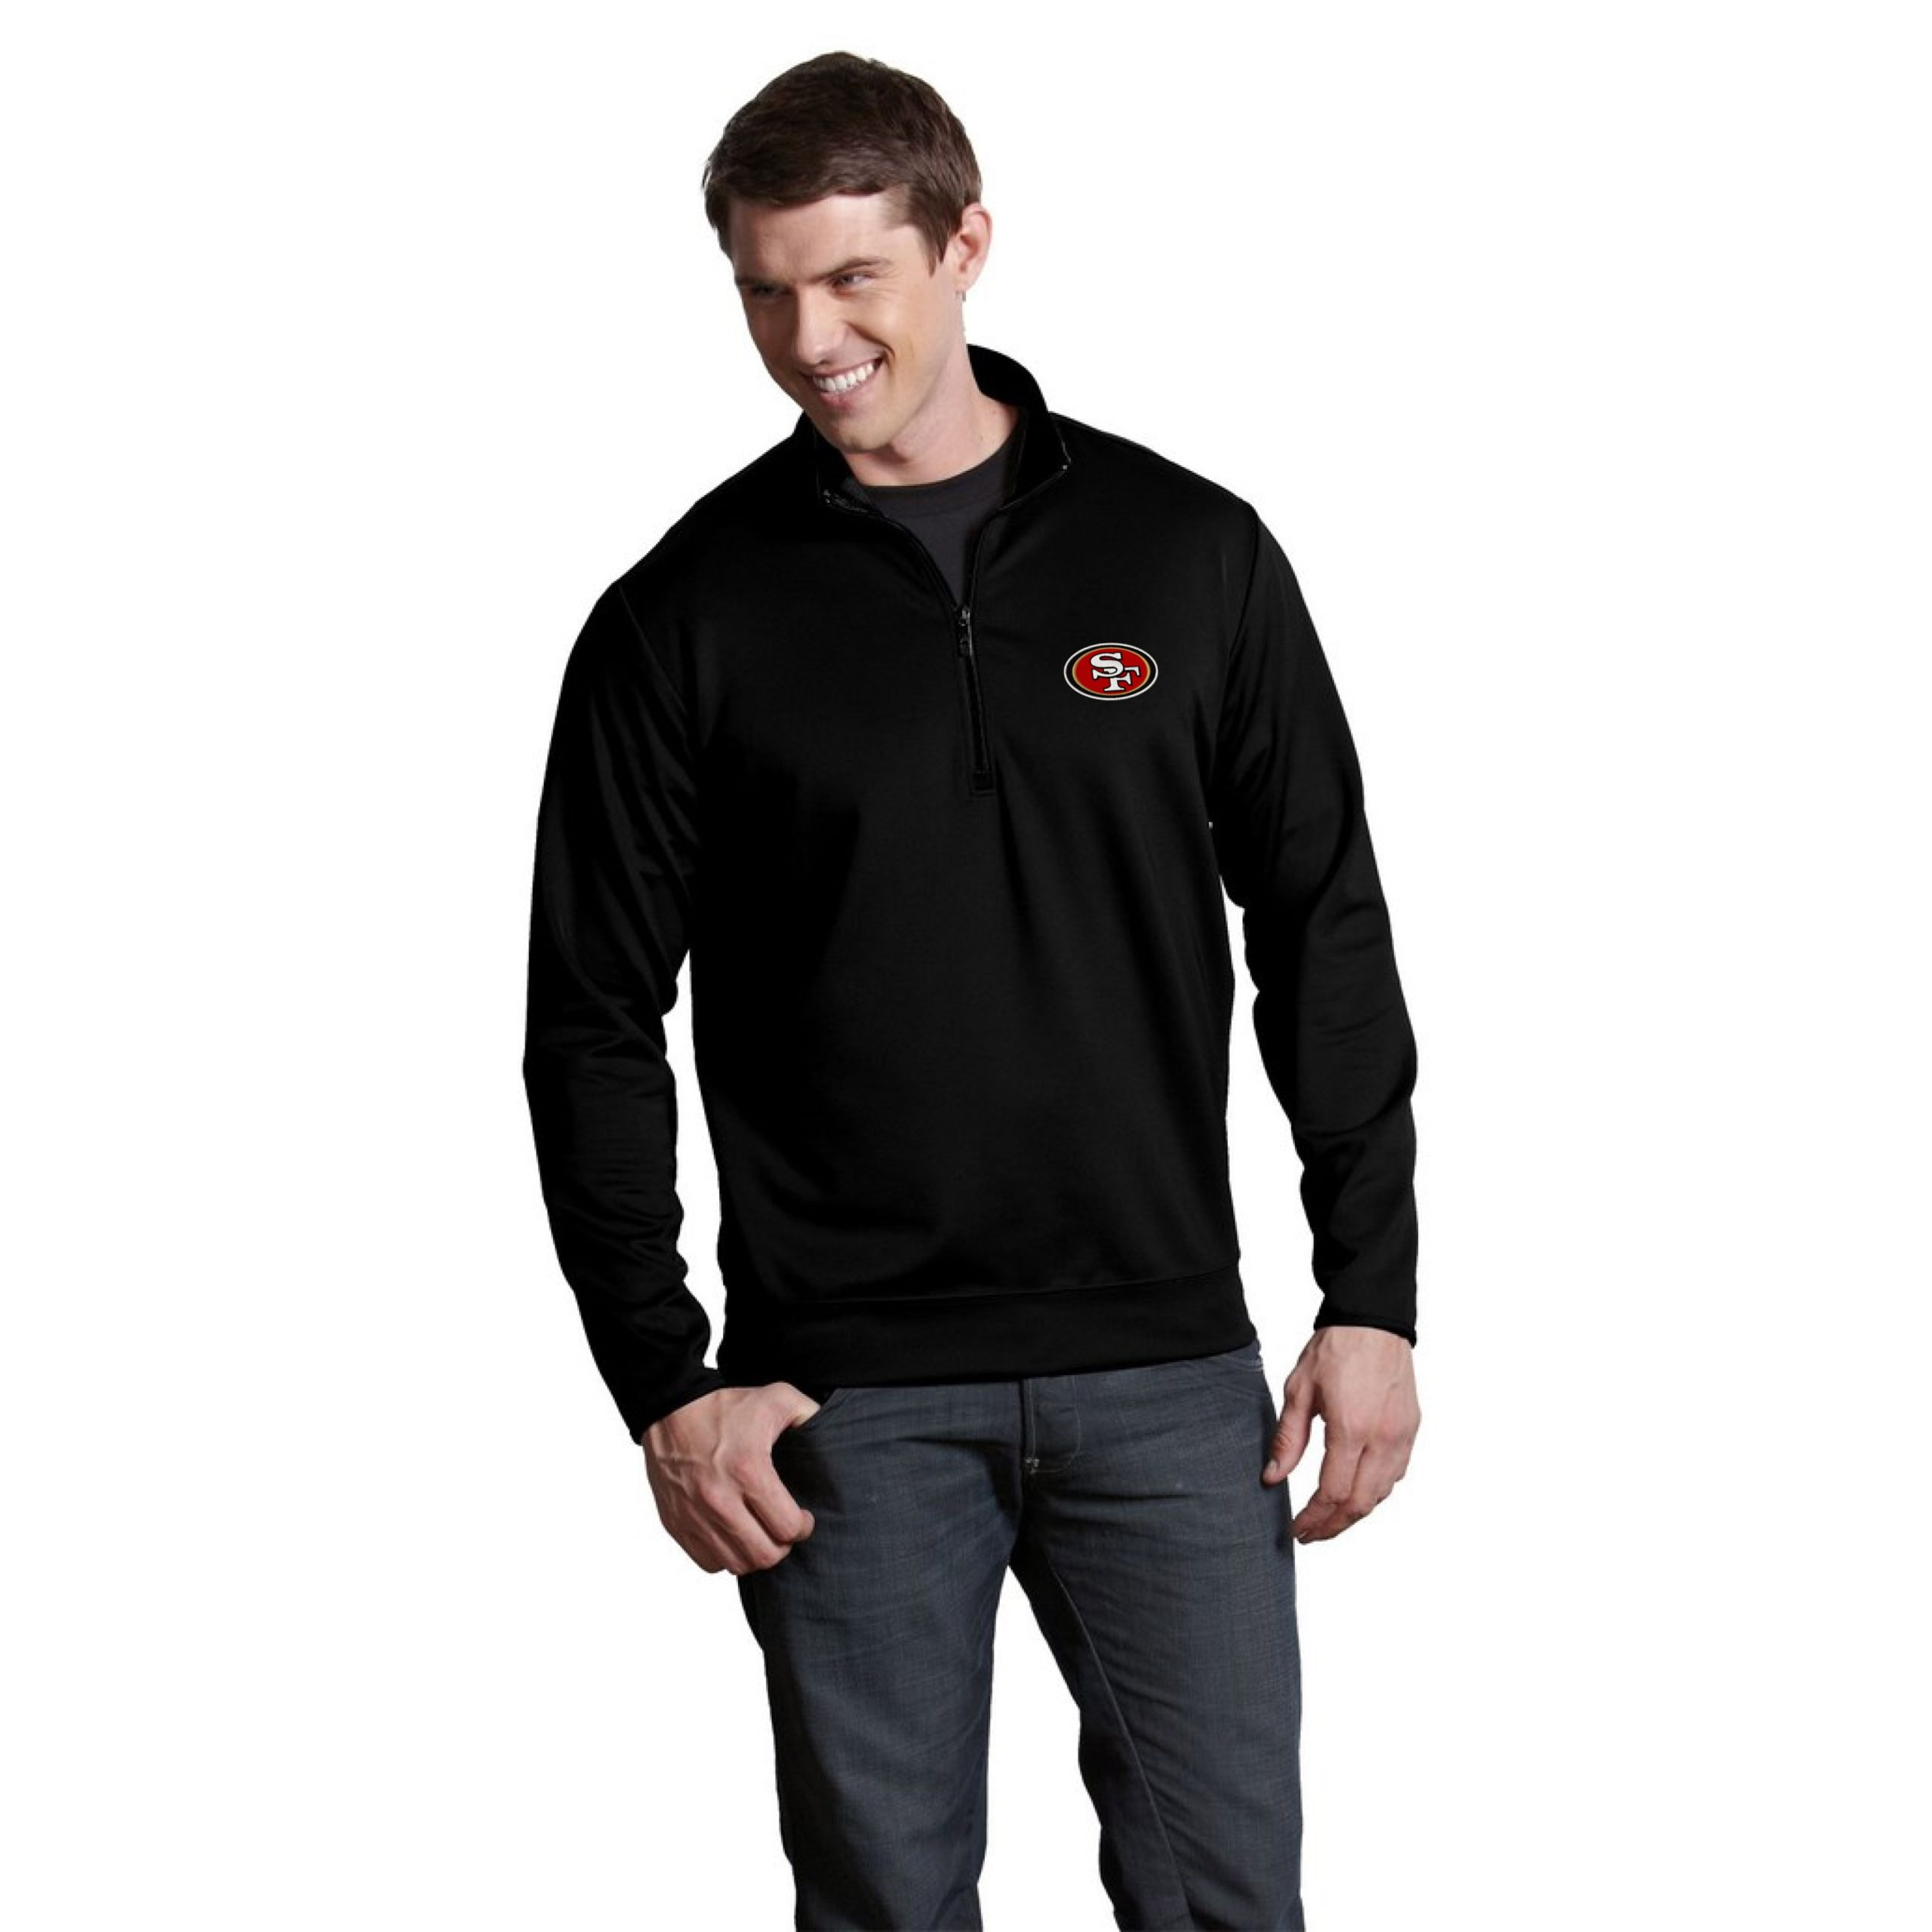 San Francisco 49ers Antigua Leader Quarter-Zip Pullover Jacket - Black